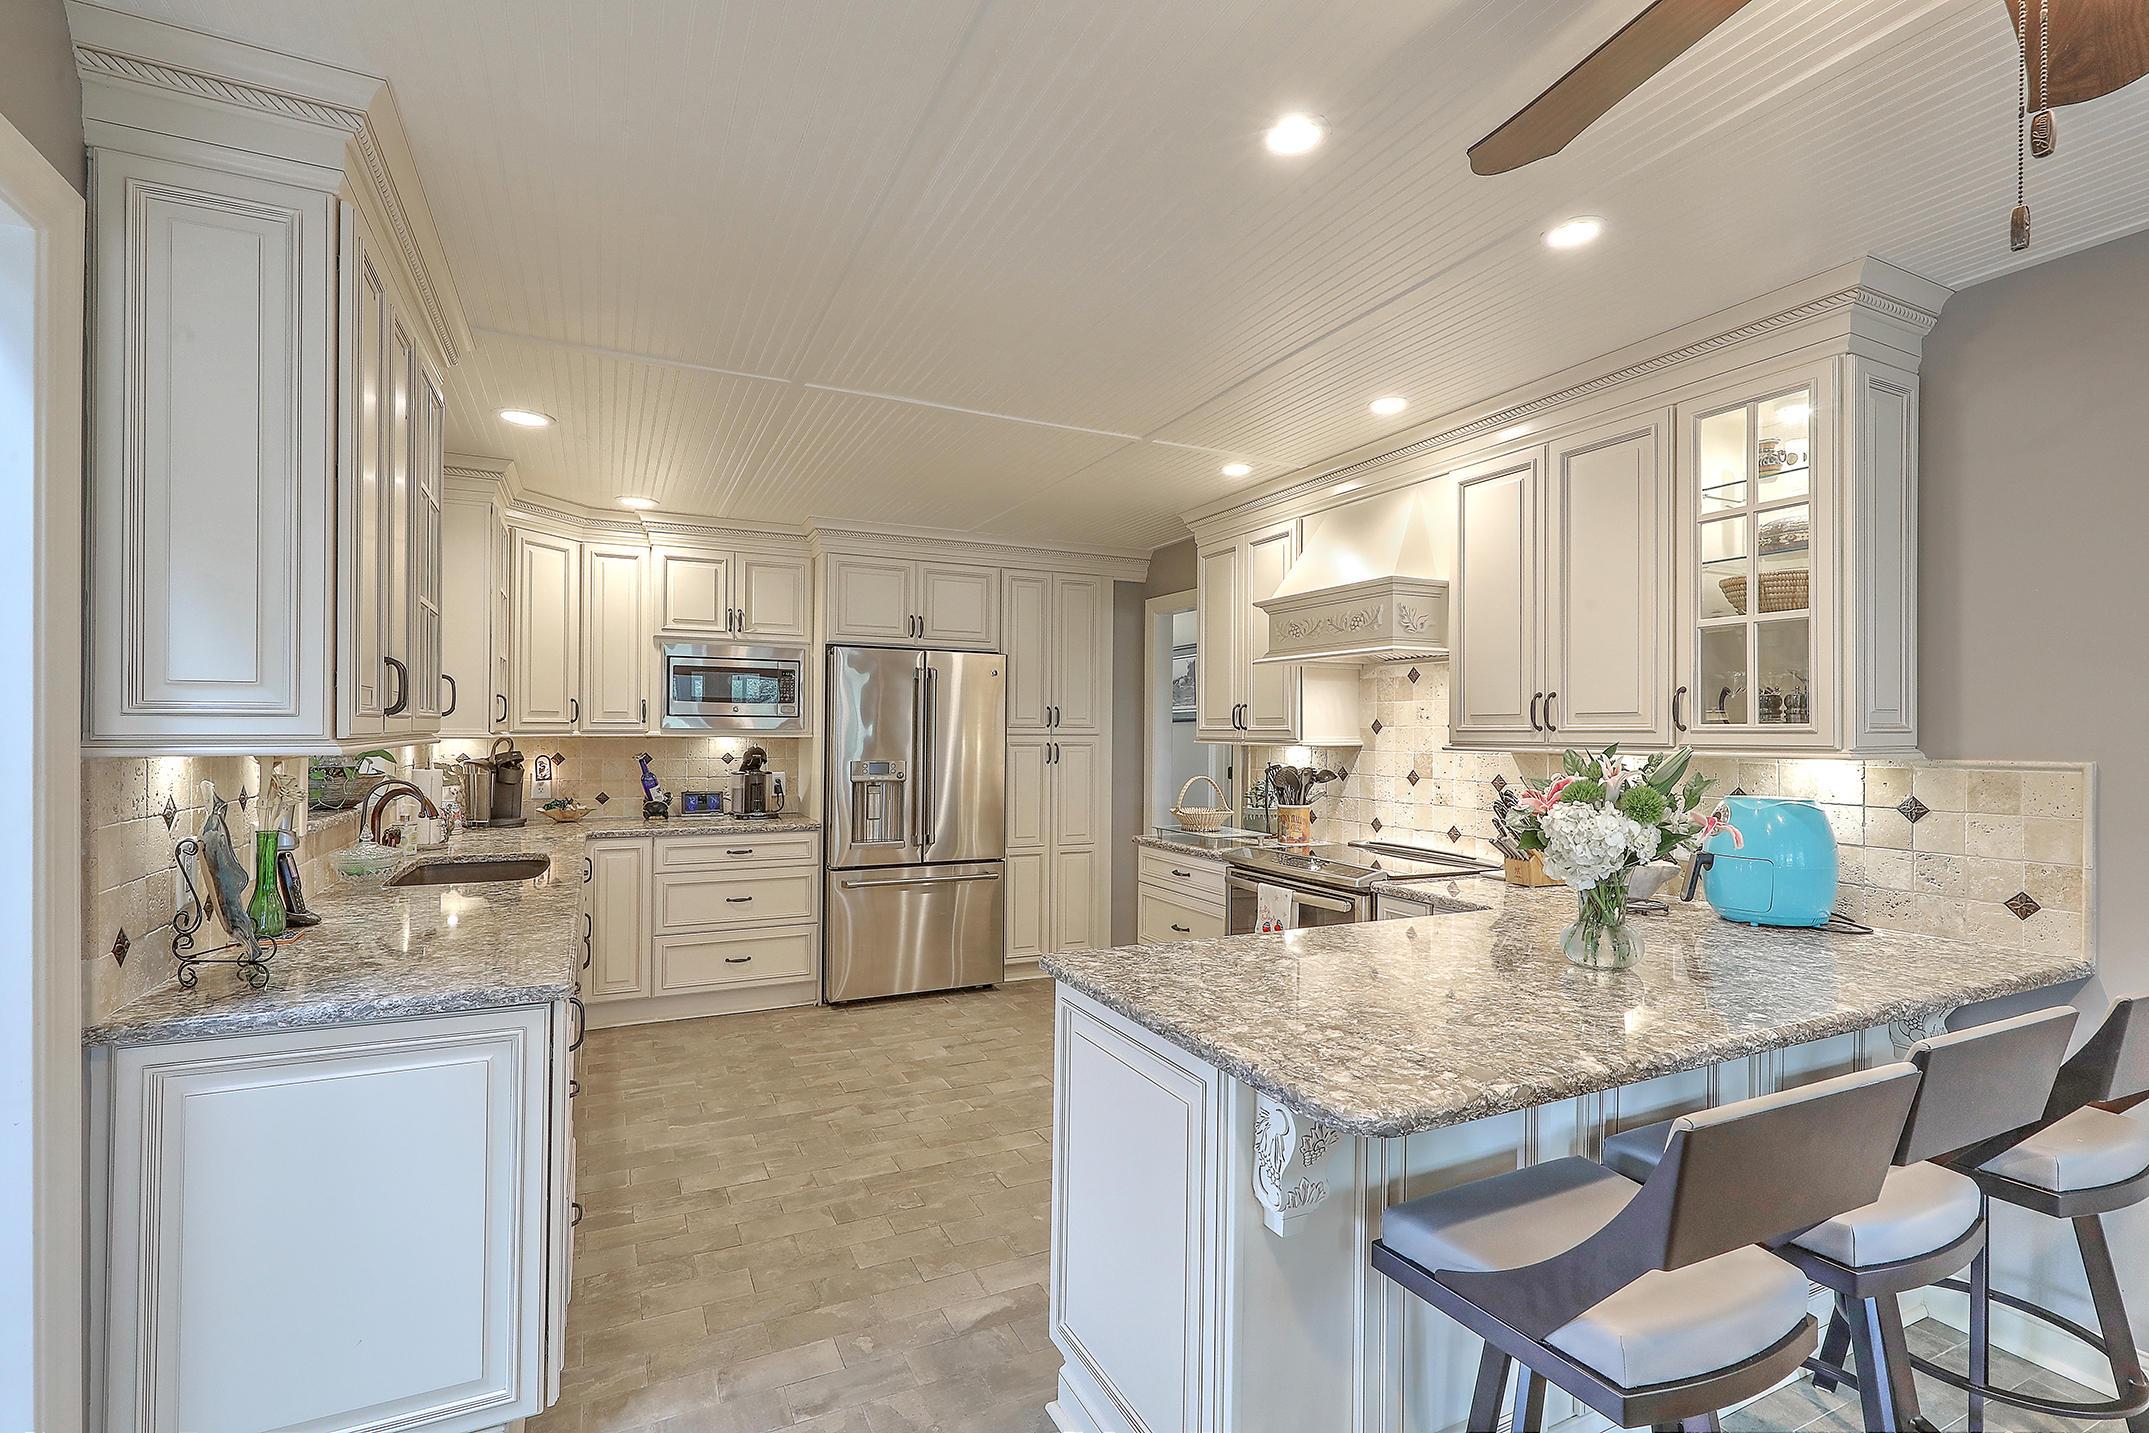 Stono Pointe Homes For Sale - 2660 Burden Creek, Johns Island, SC - 64